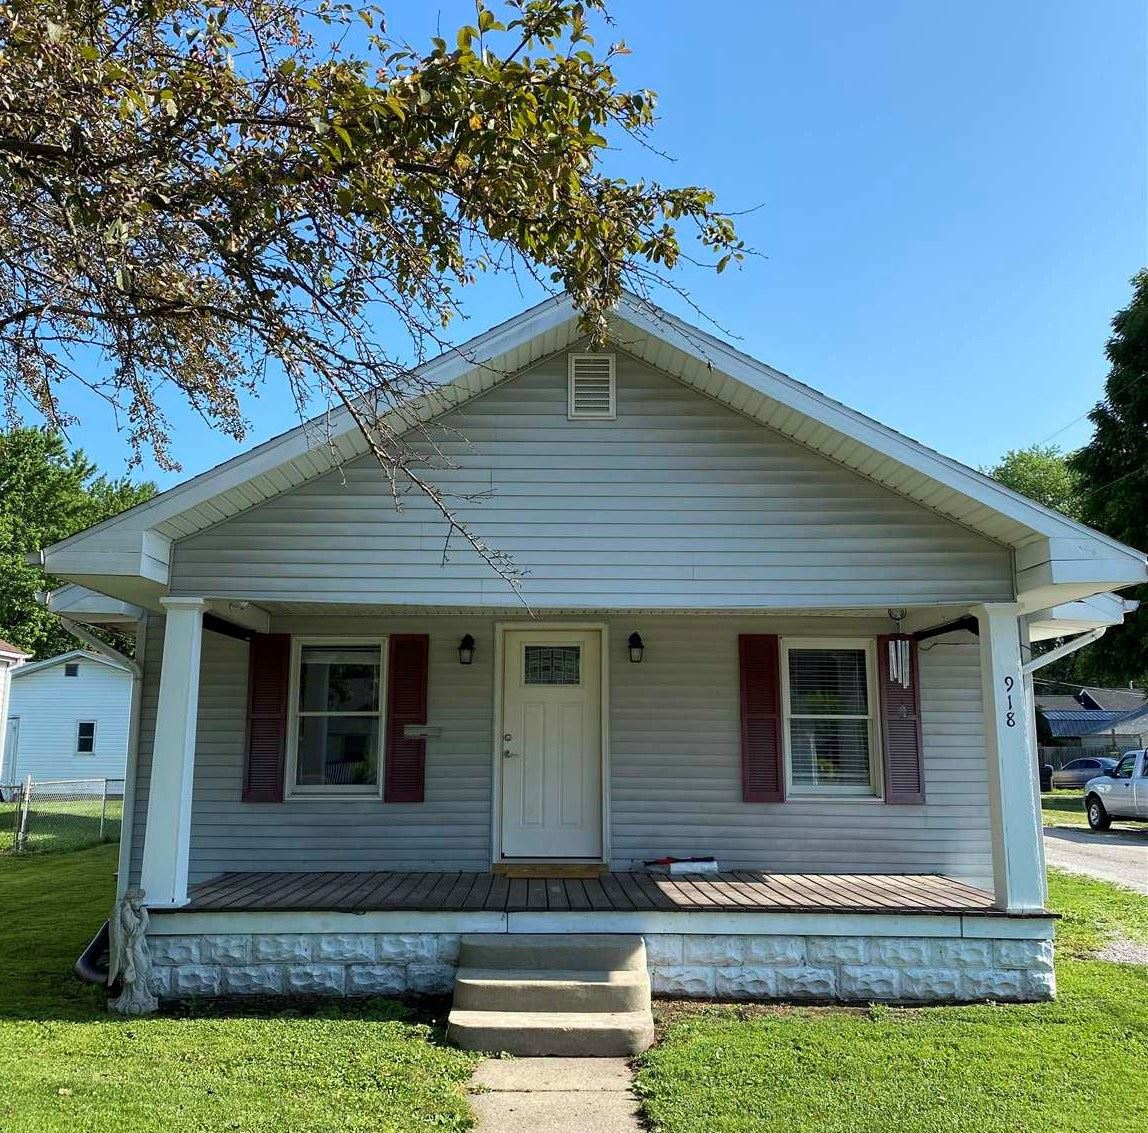 918 E Morgan Street, Kokomo, IN 46901 - MLS#: 202125153